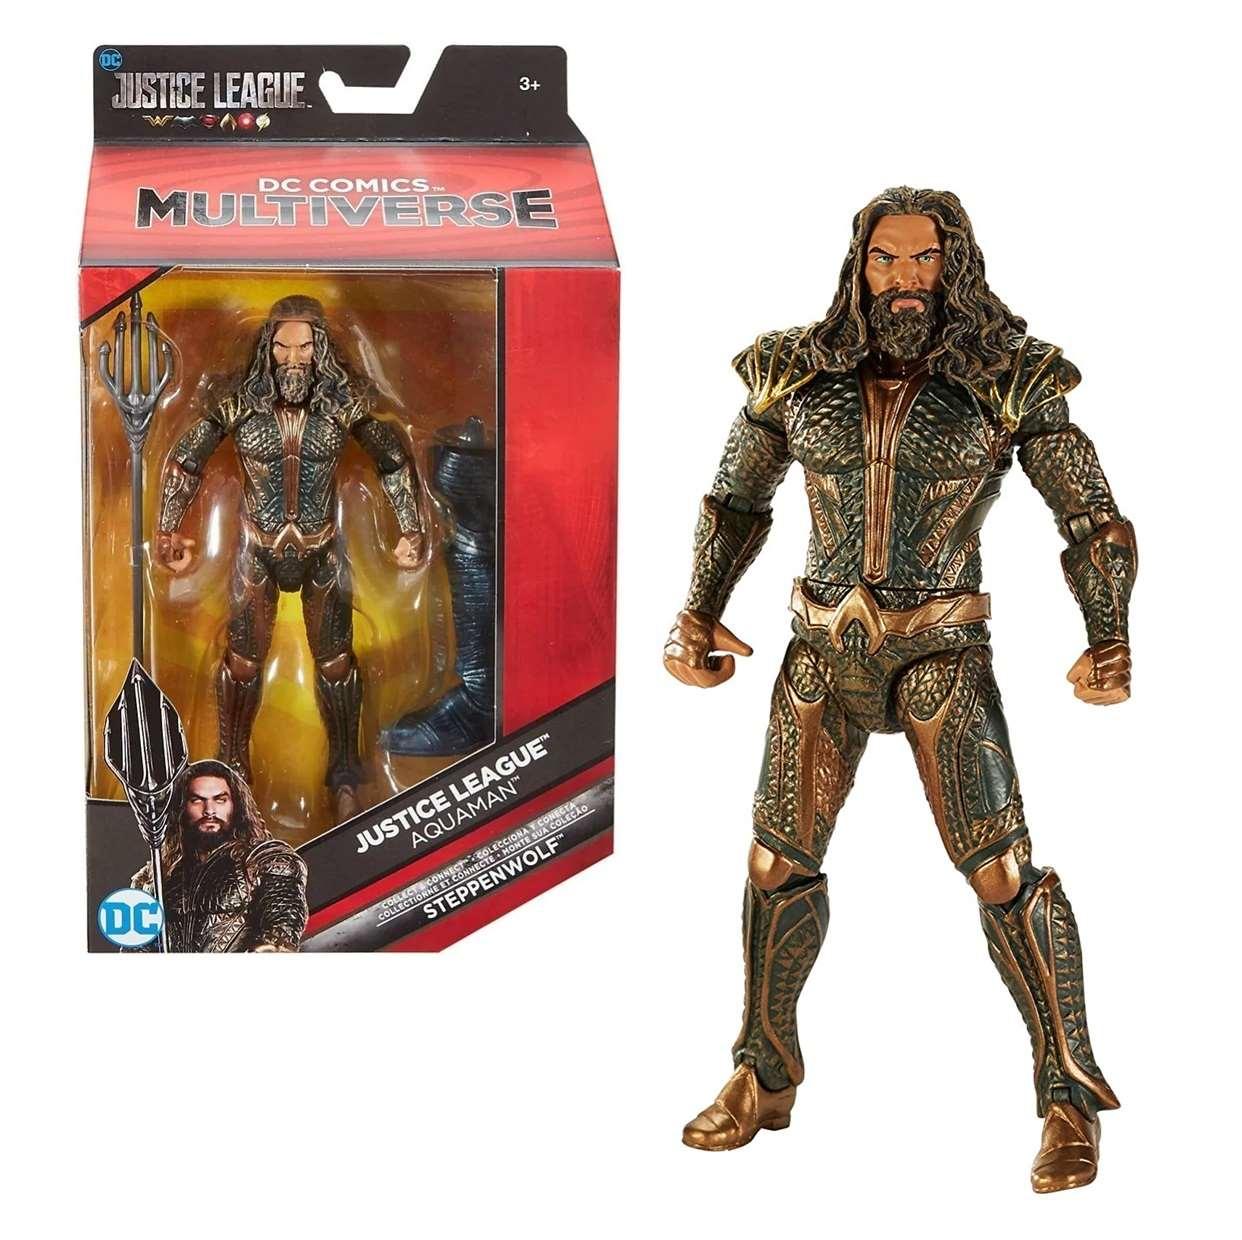 Aquaman Figura Dc Justice League Steppenwolf Multiverse